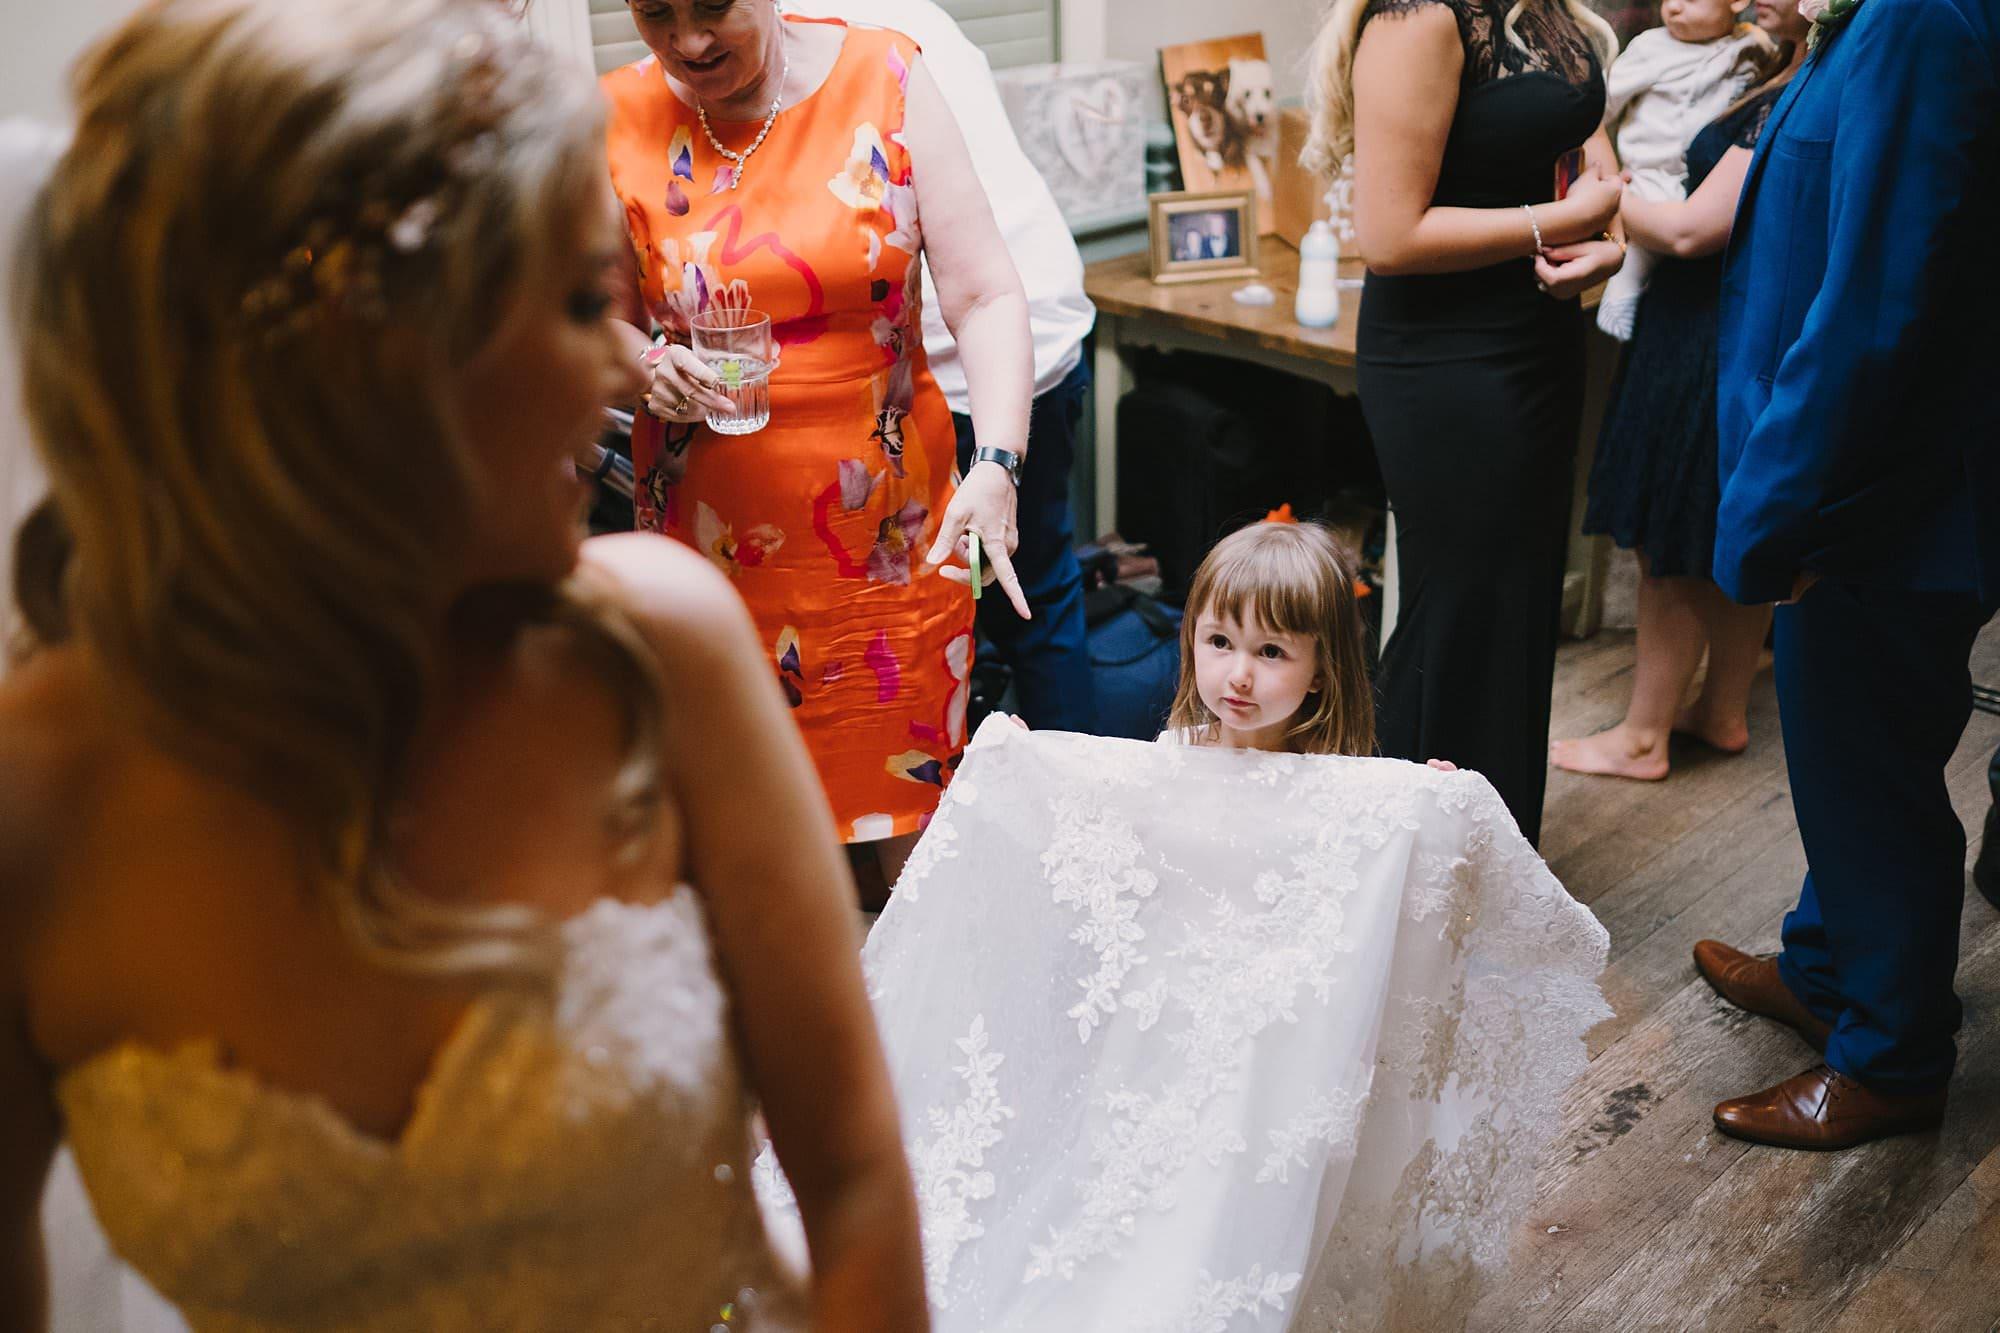 london pub wedding photographer jn 064 - The County Arms Wedding Photographer   Jen & Nick